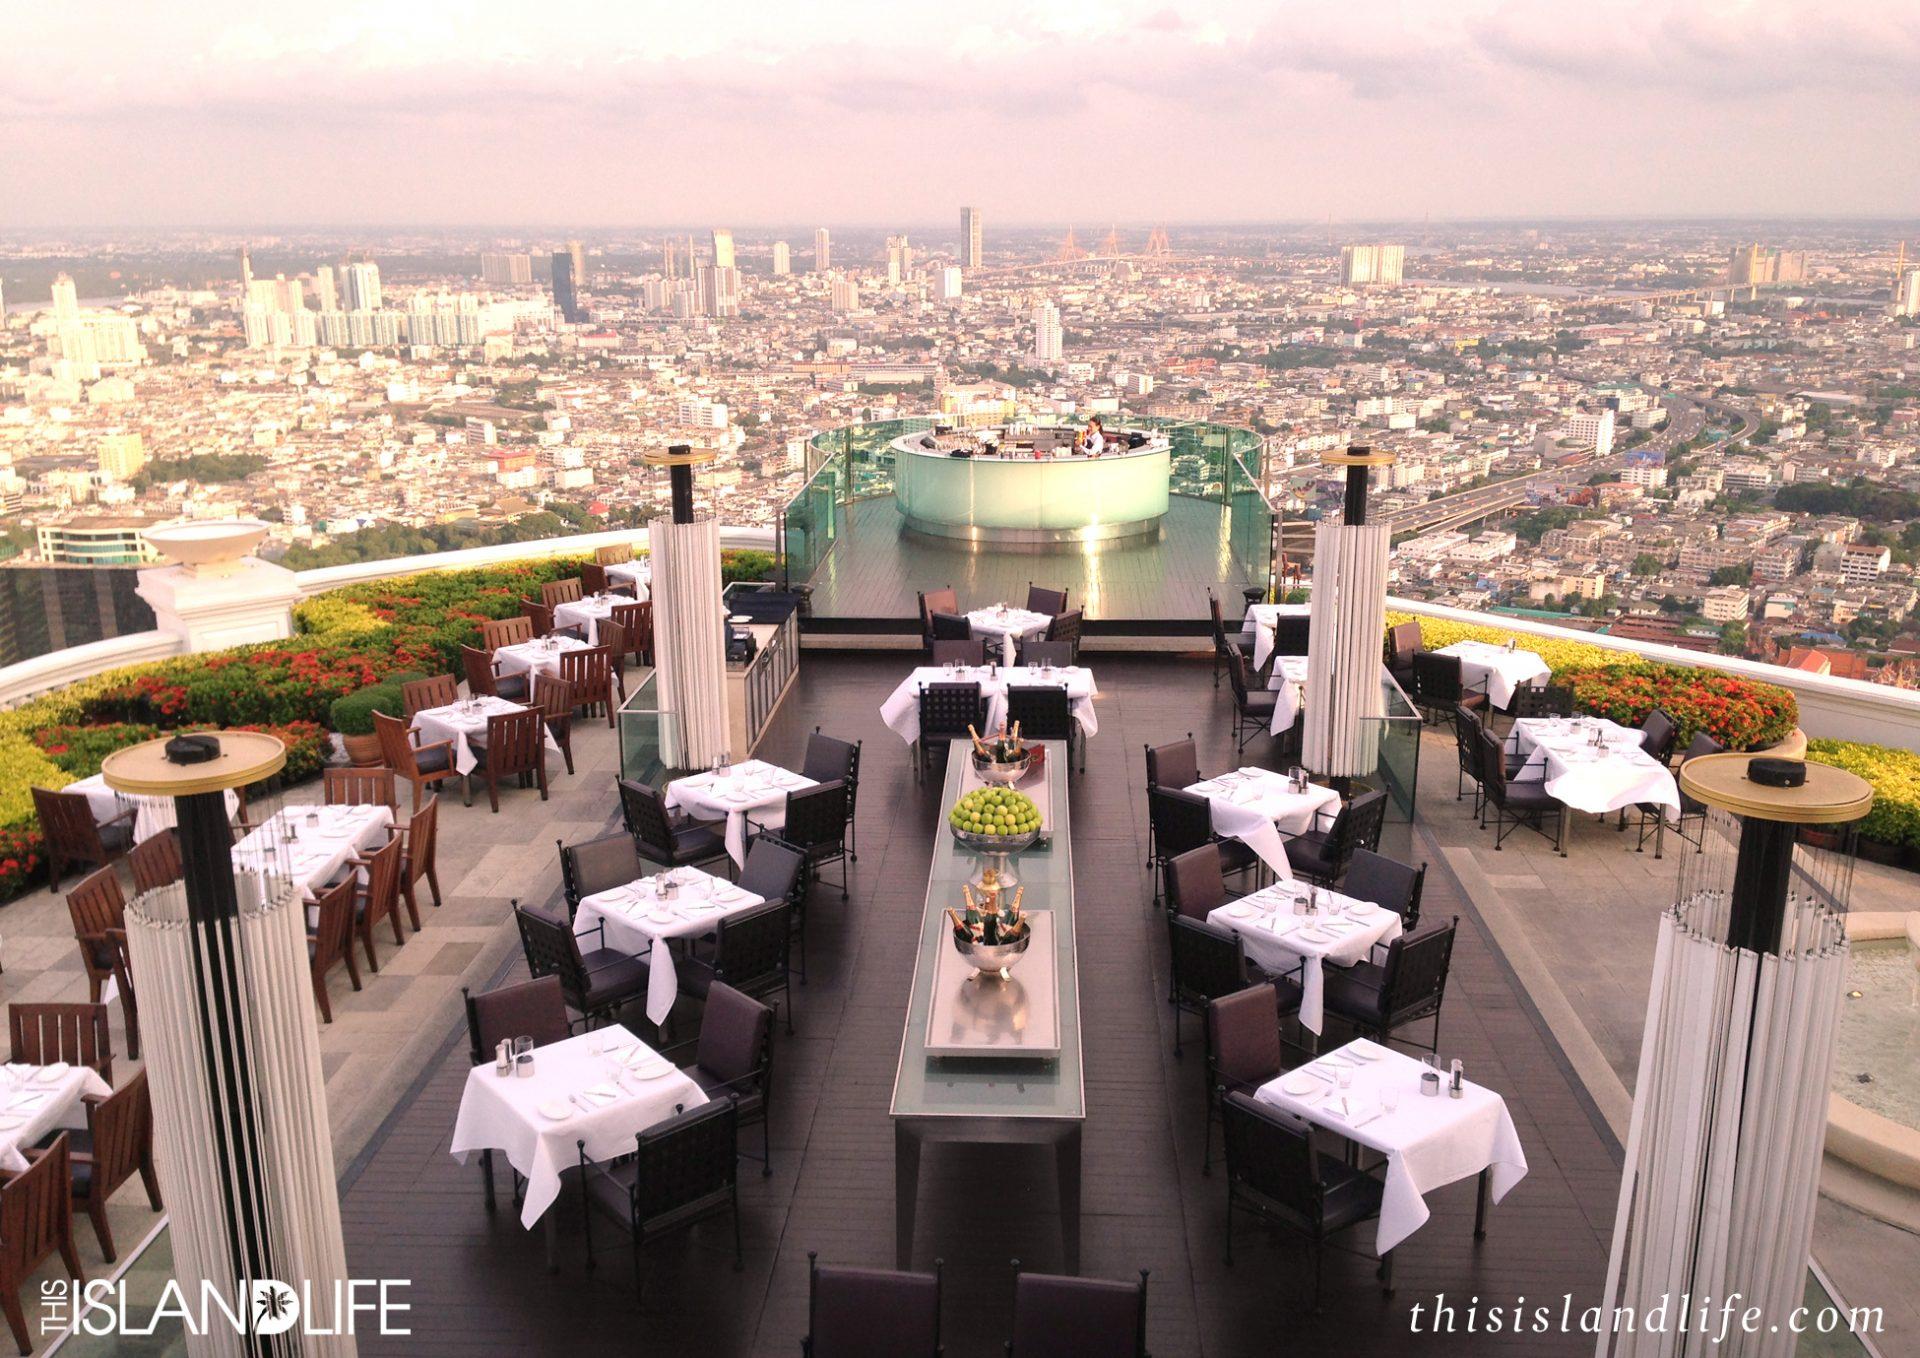 this-island-life-sky-bar-sirocco-lebua-state-tower-bangkok-thailand-2-wm